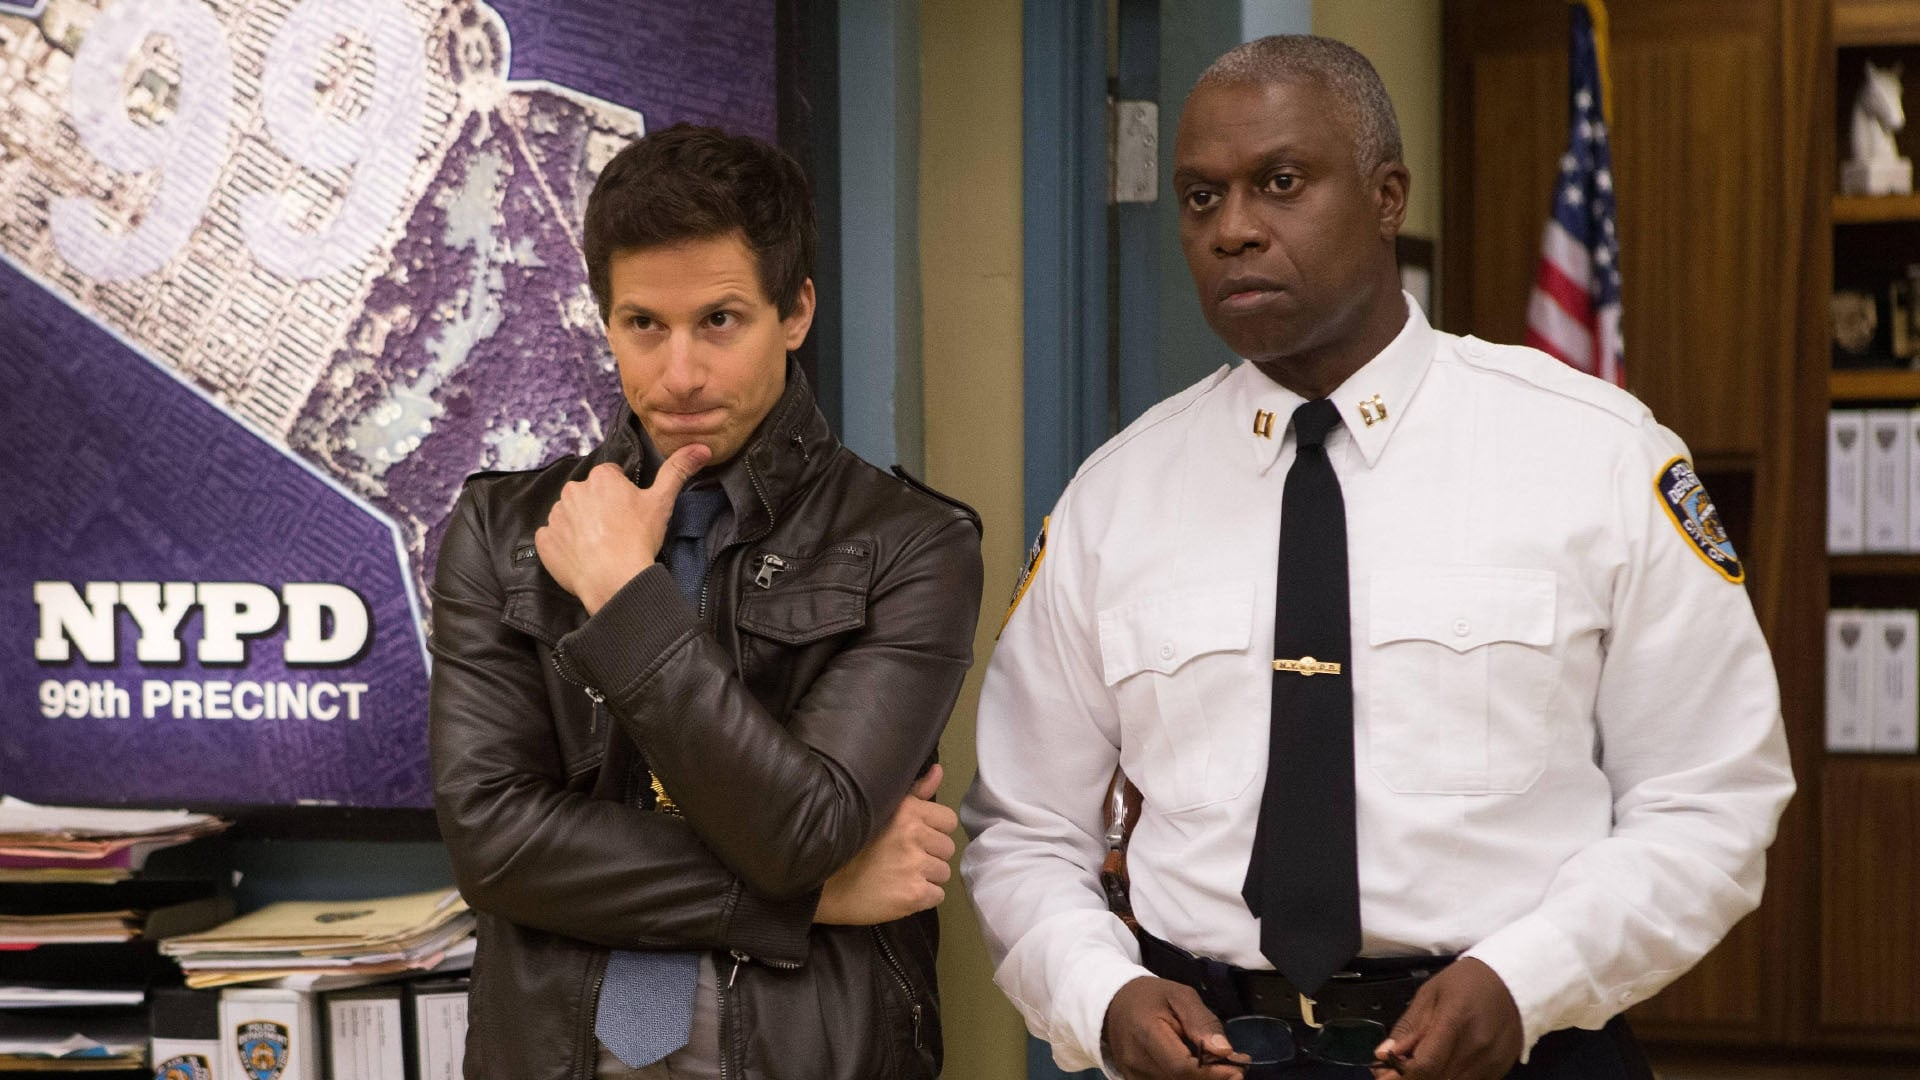 Brooklyn Nine-Nine - Season 1 Episode 7 : 48 Hours